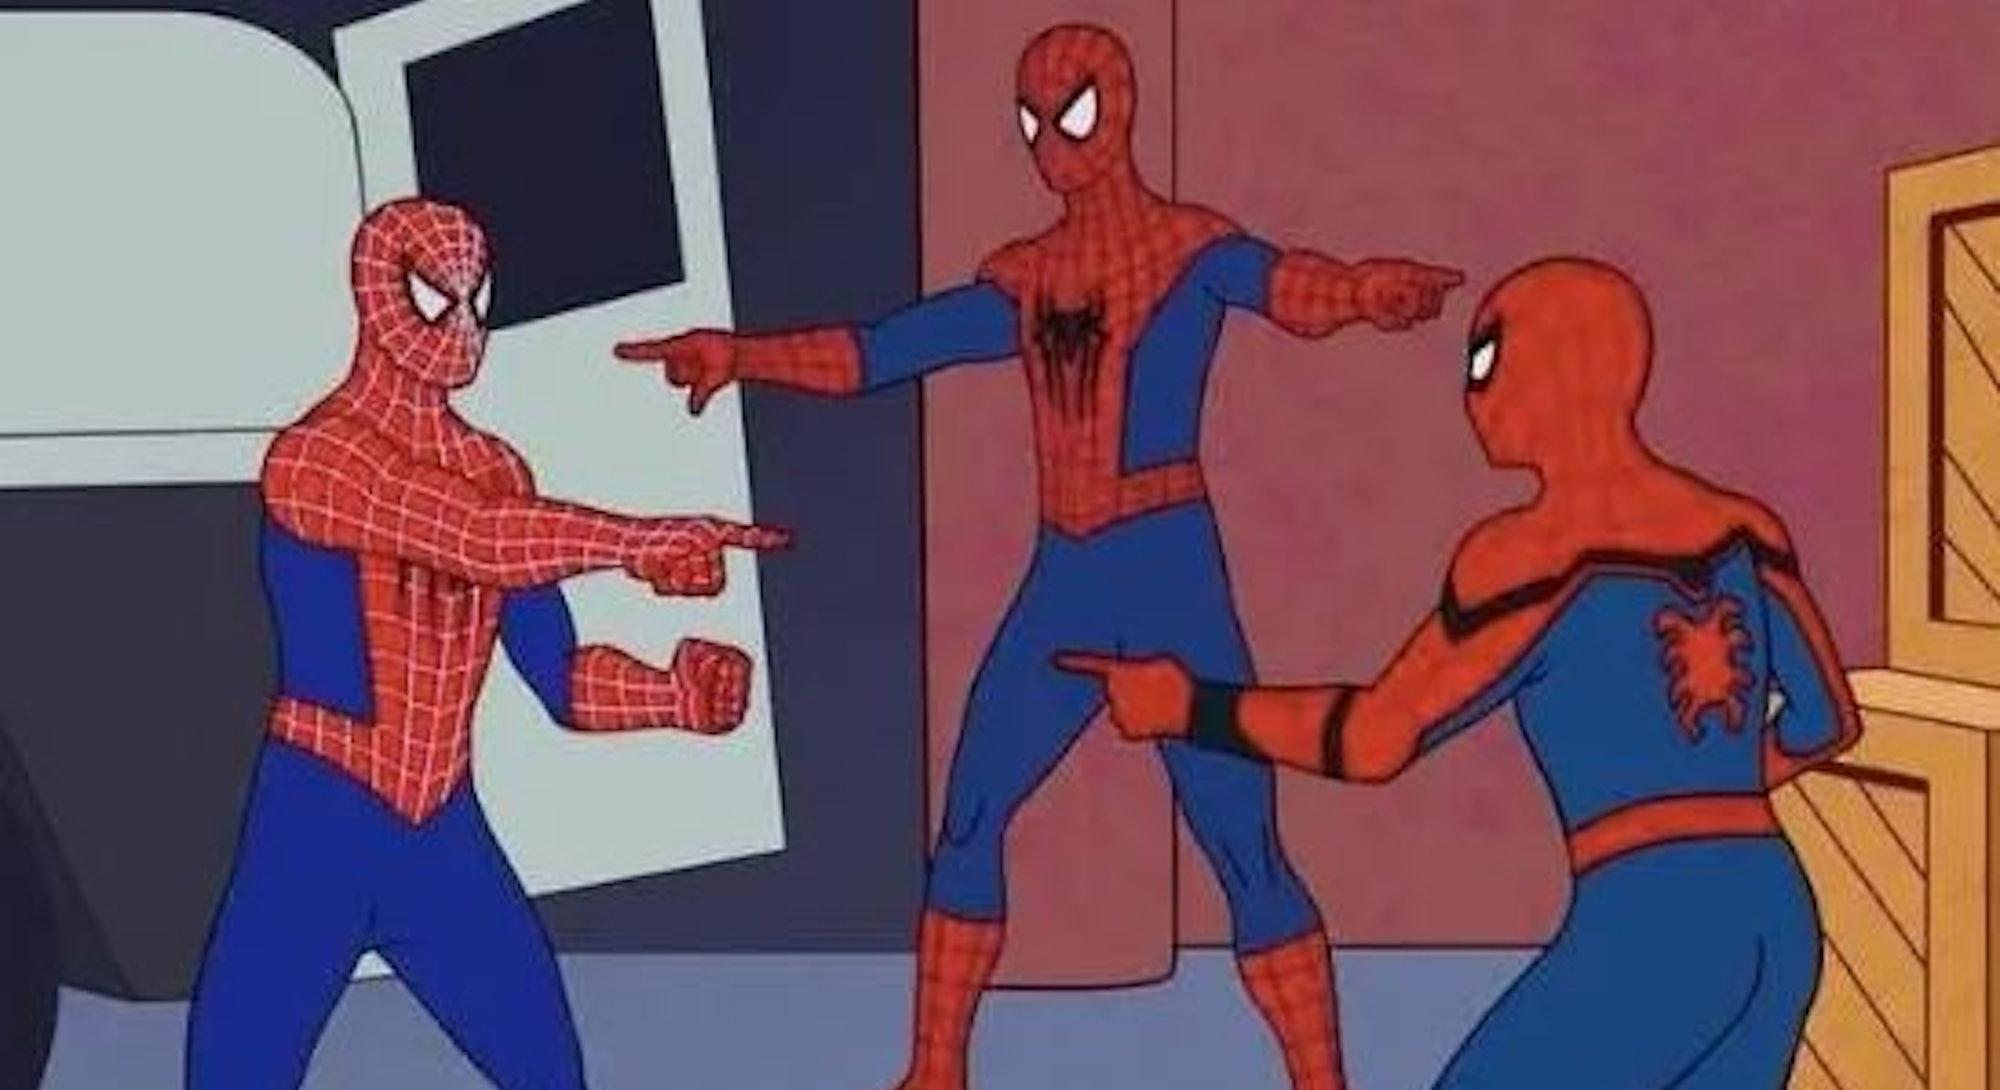 Spider Man meme pointing